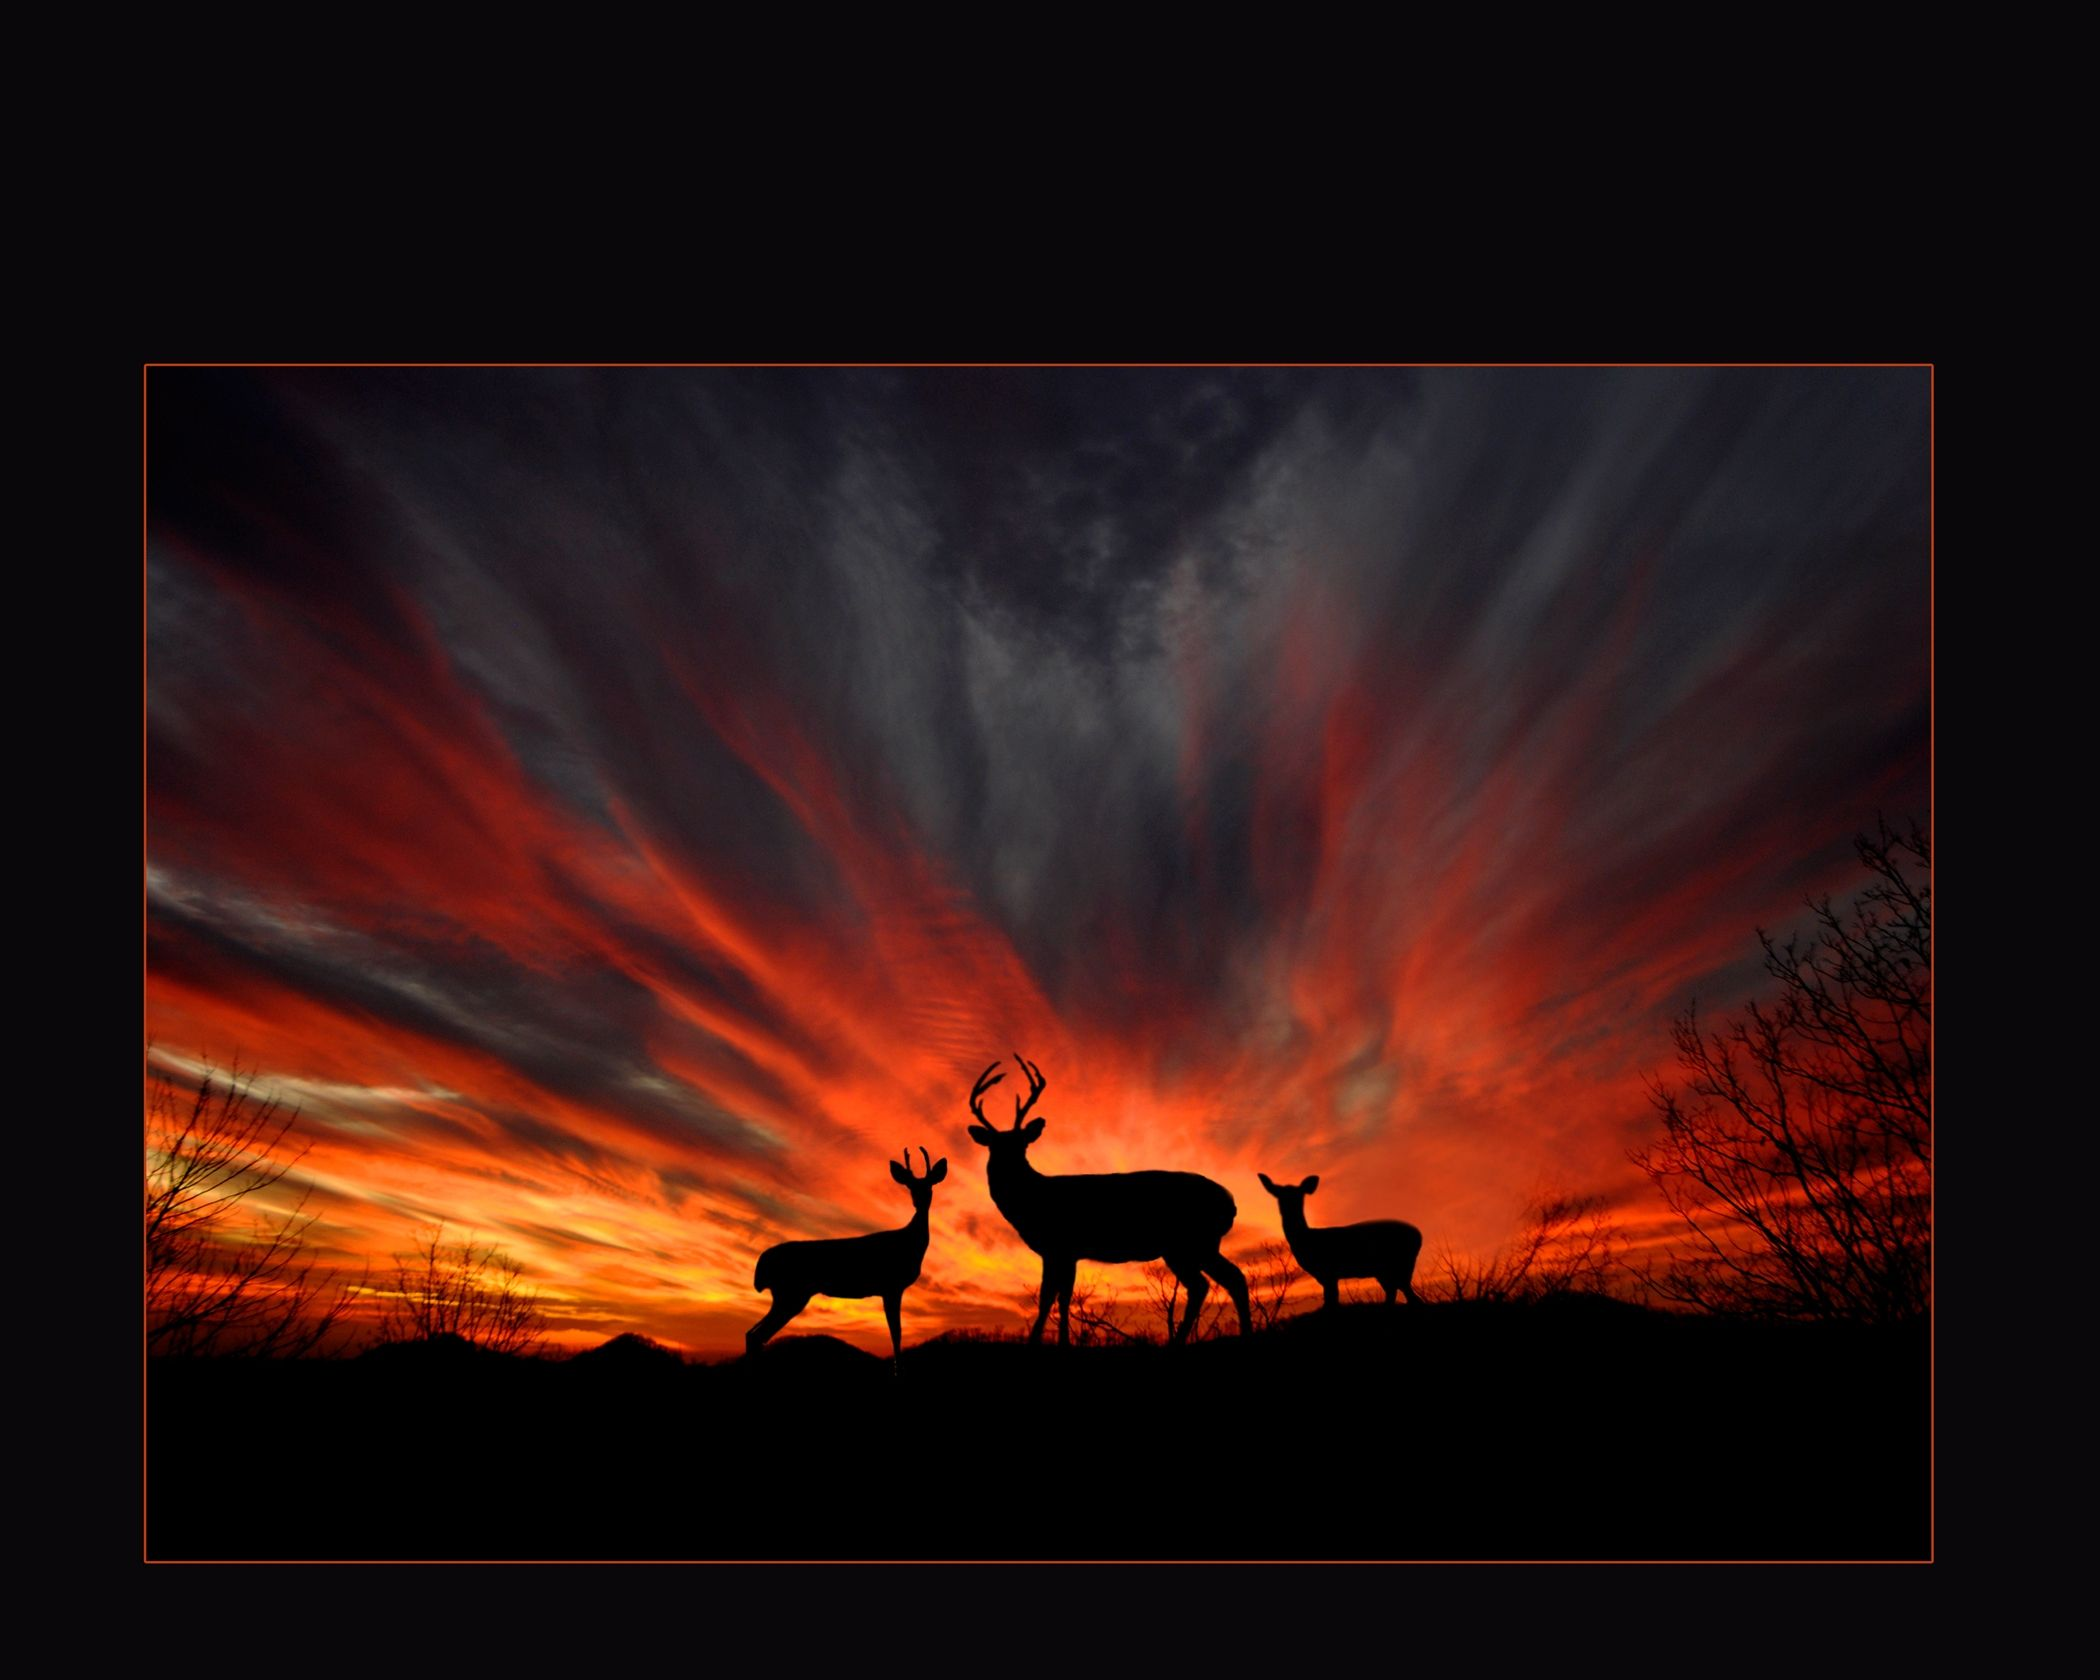 Deer Sunset. Photo by Tim Tilley